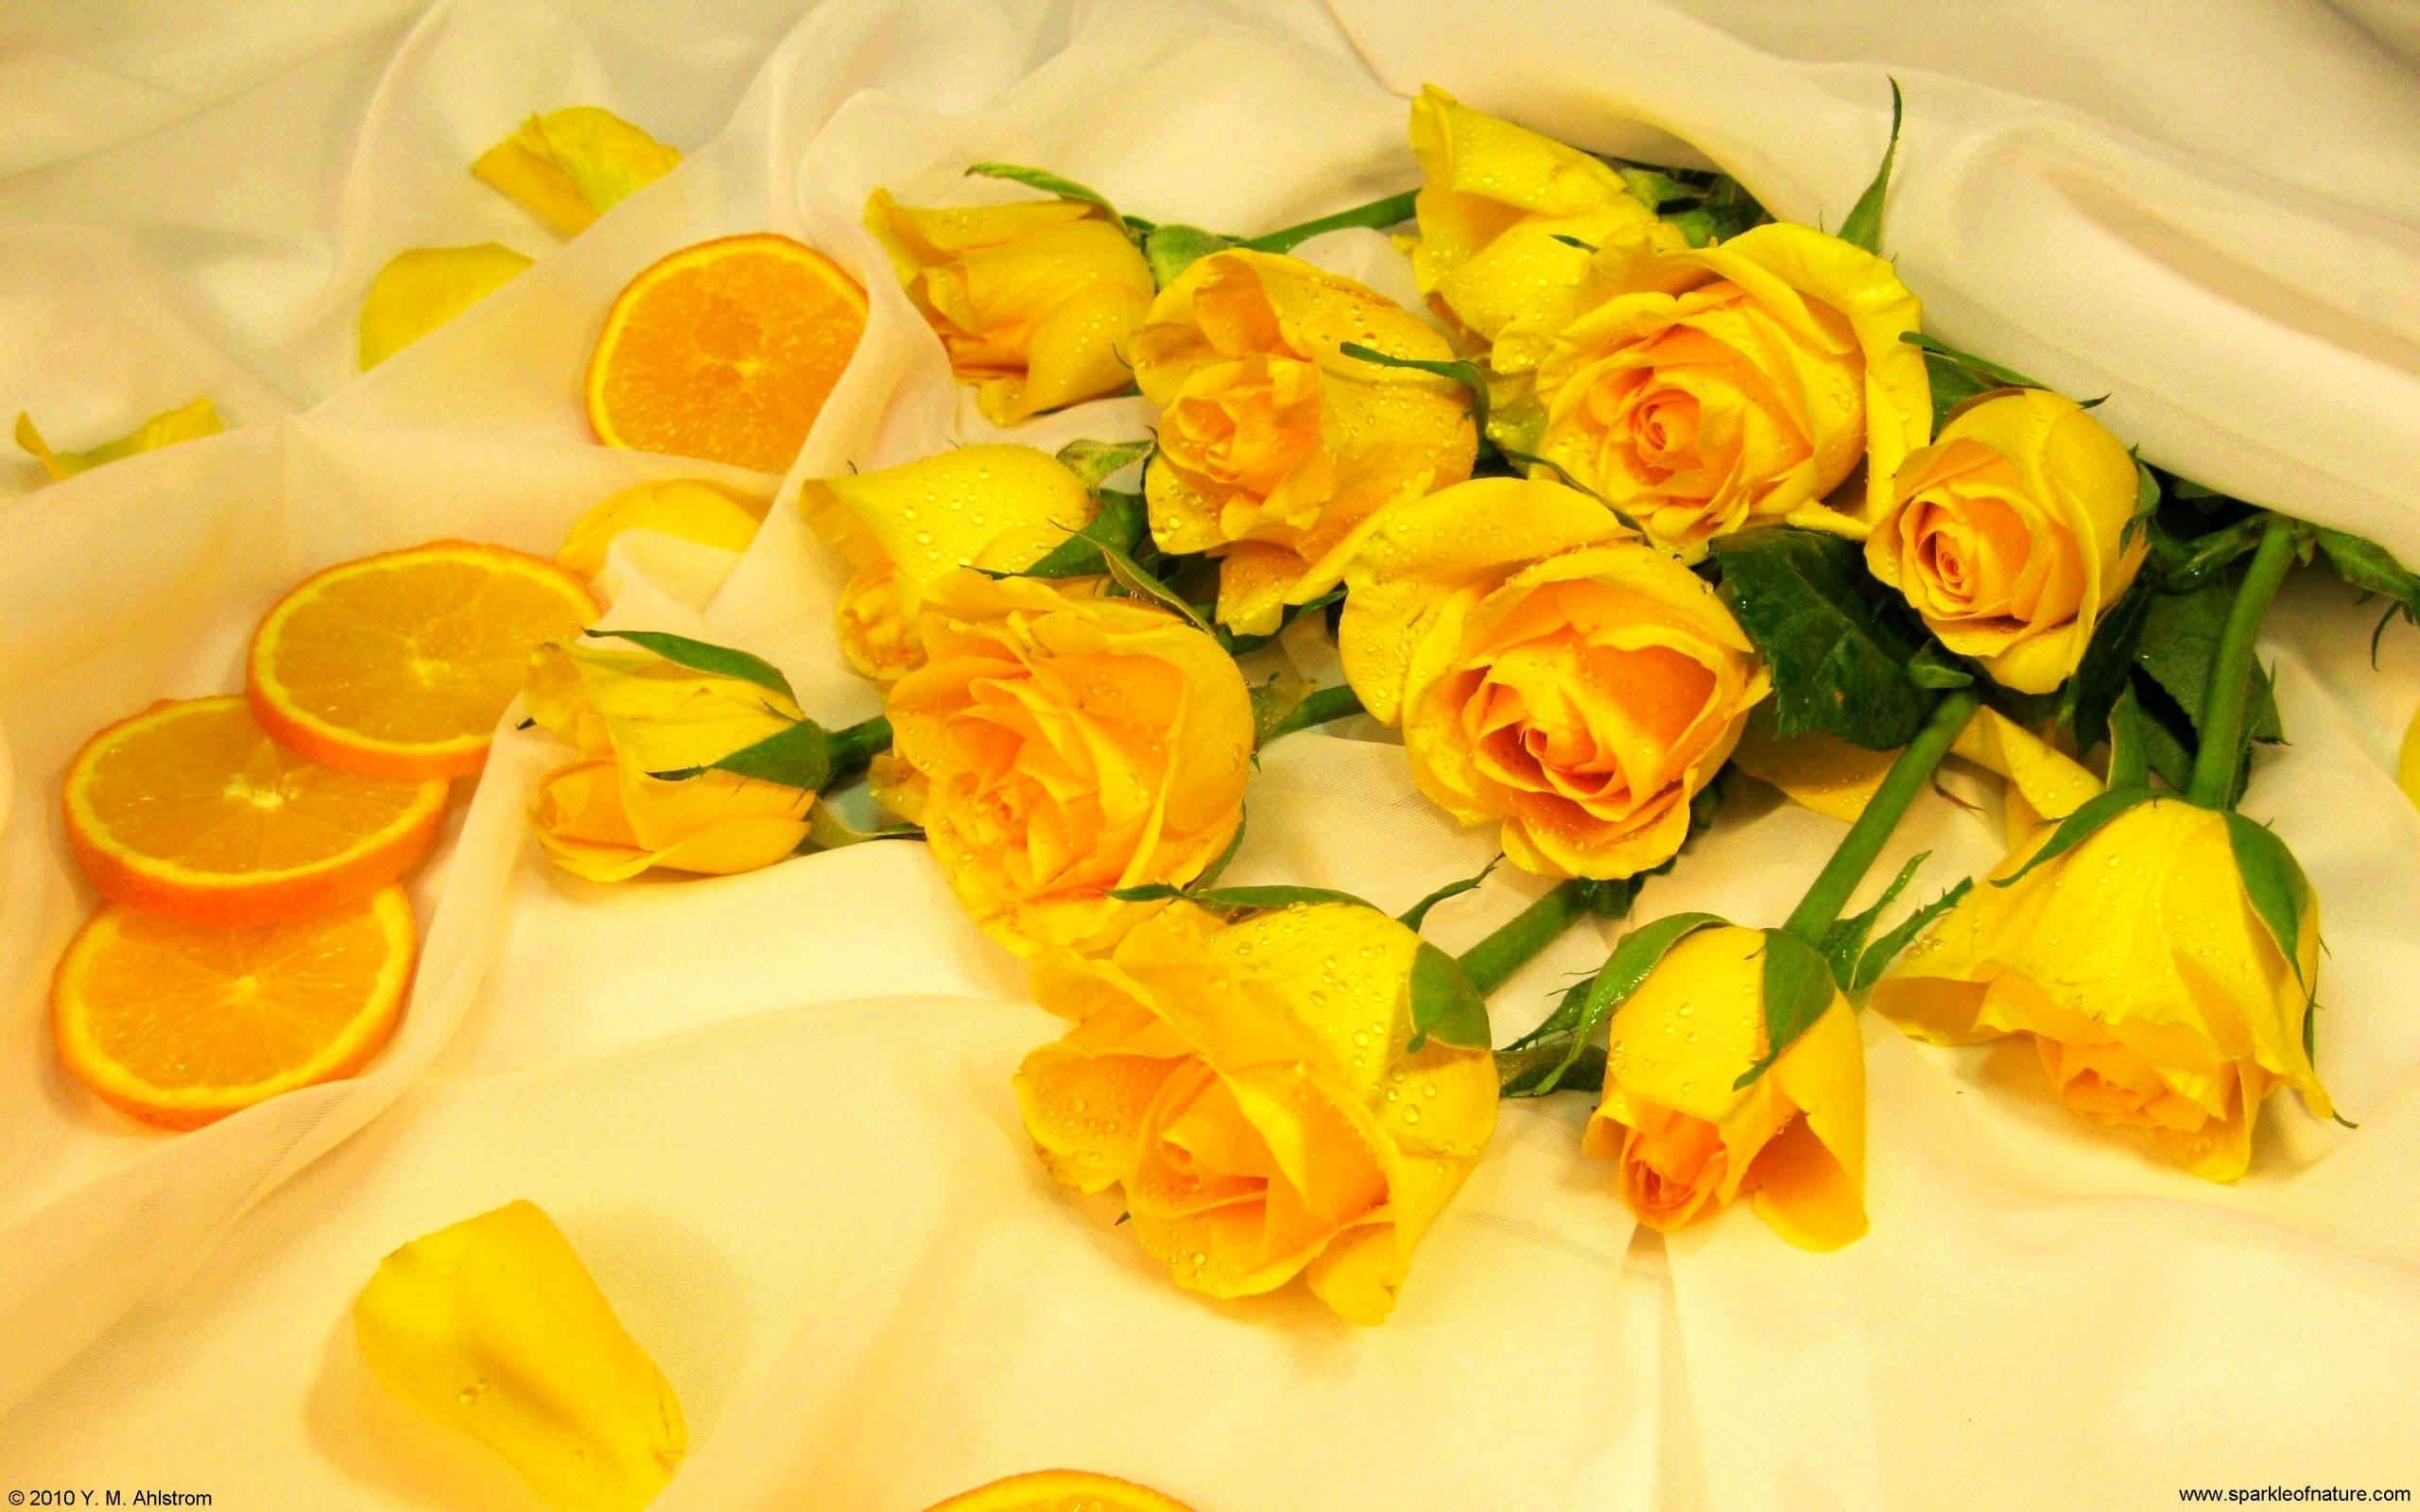 Ozihaki Wallpaper Hd New Desktop Wallpaper Flowers Aesthetic In 2020 Yellow Aesthetic Flower Aesthetic Flower Desktop Wallpaper